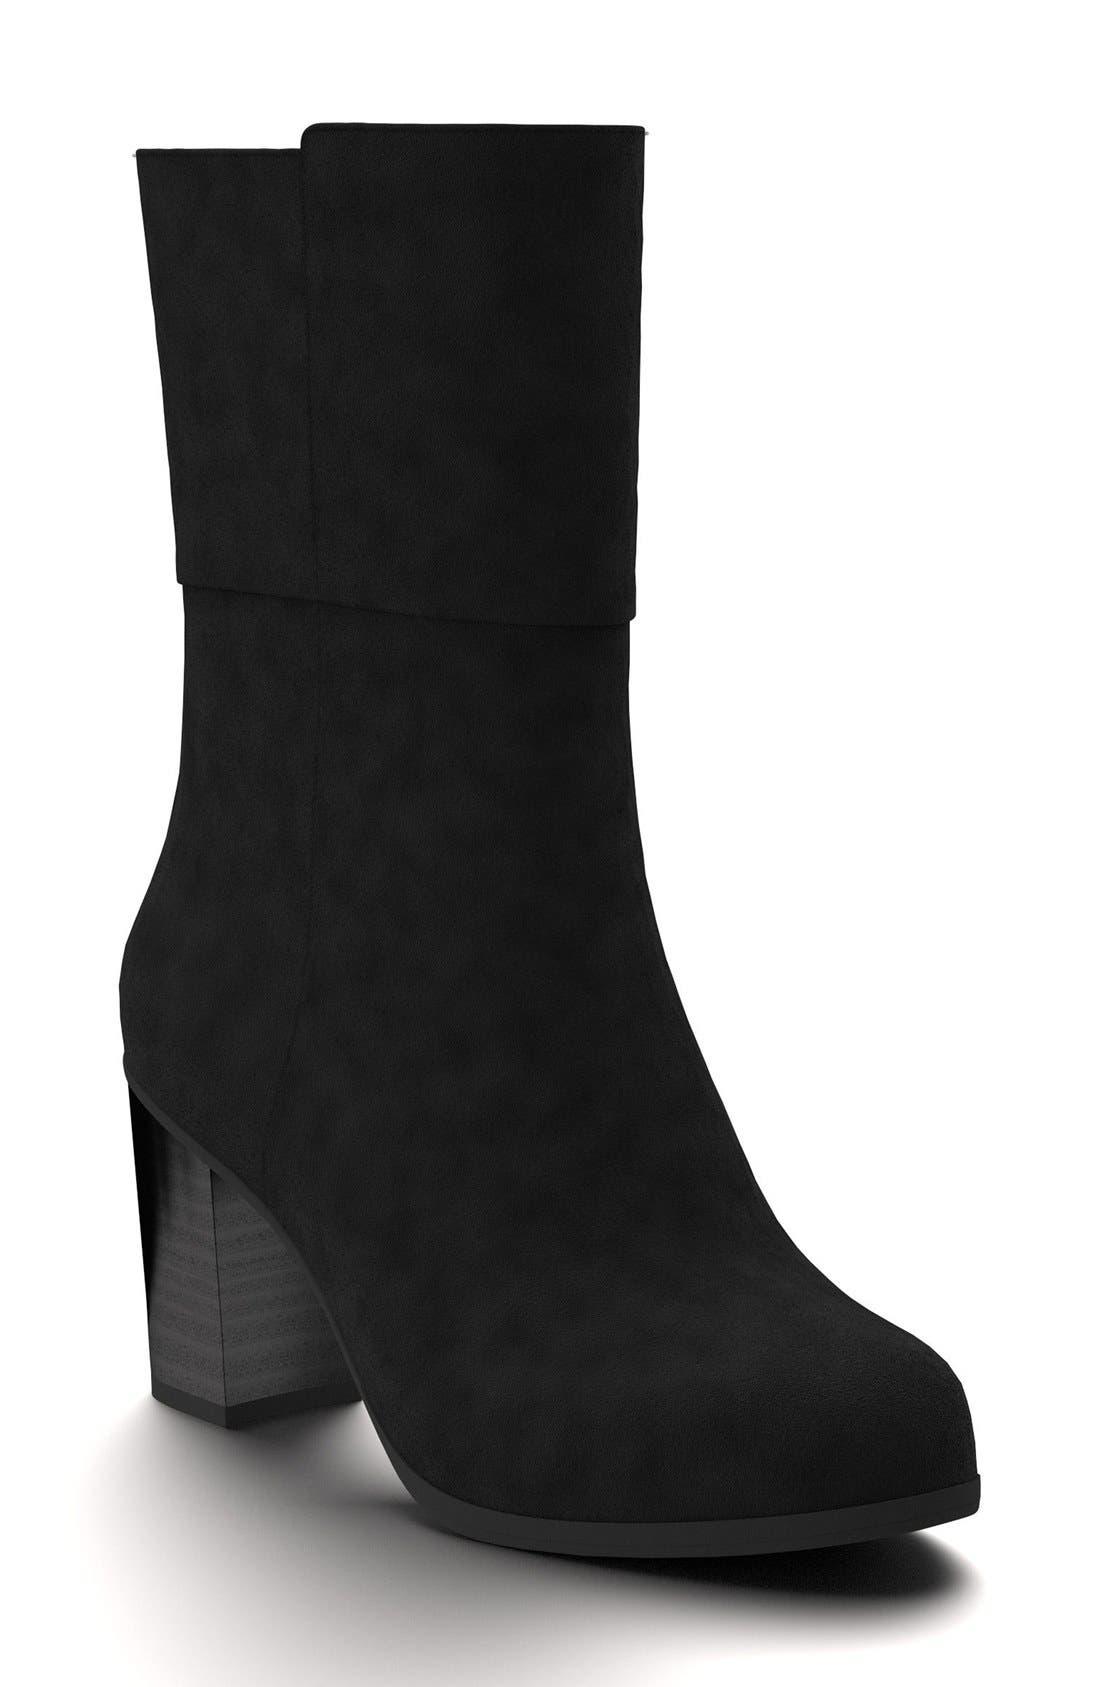 Alternate Image 1 Selected - Shoes of Prey Block Heel Boot (Women)